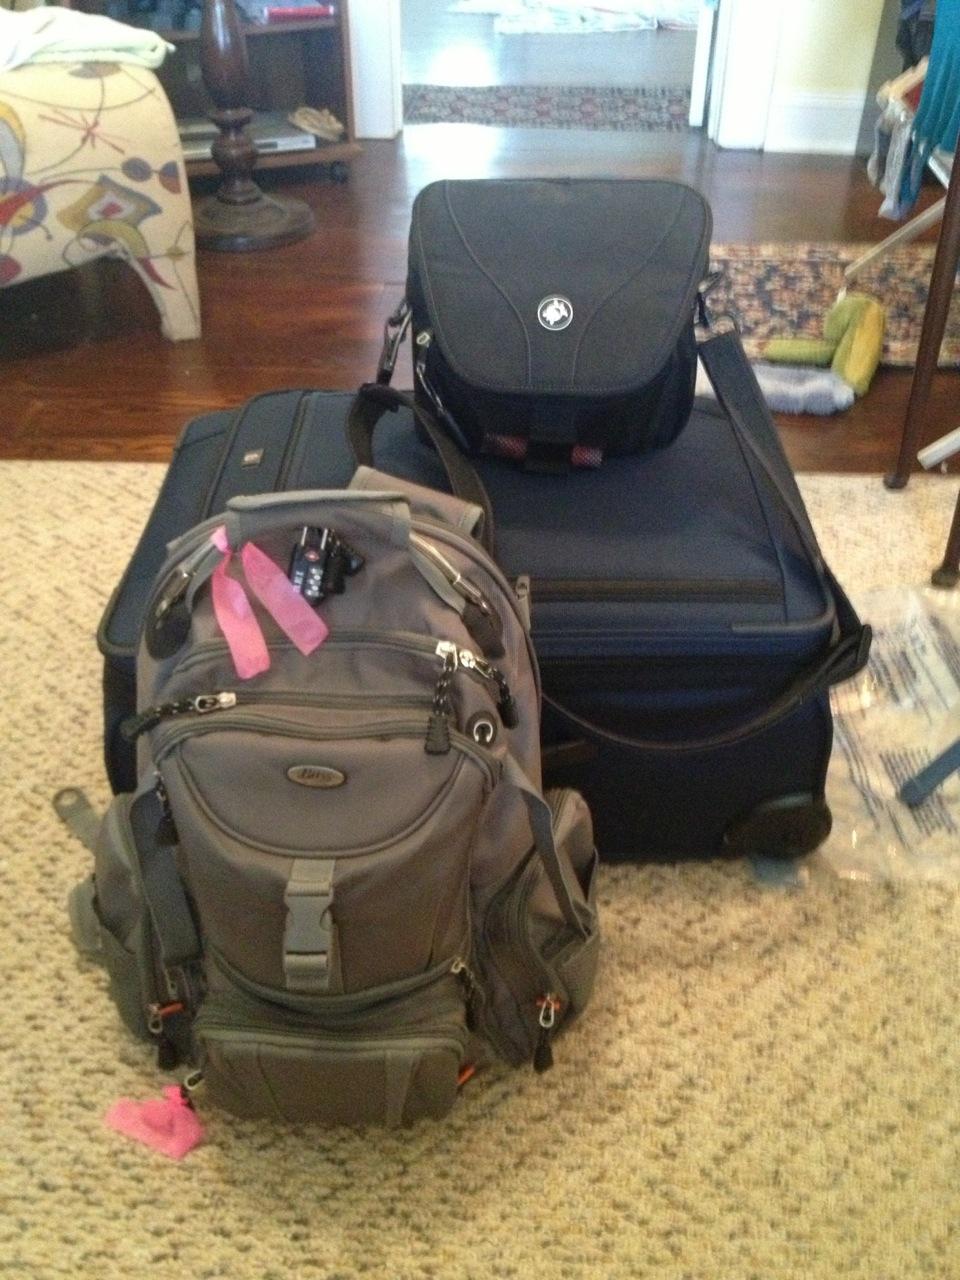 packed.jpg